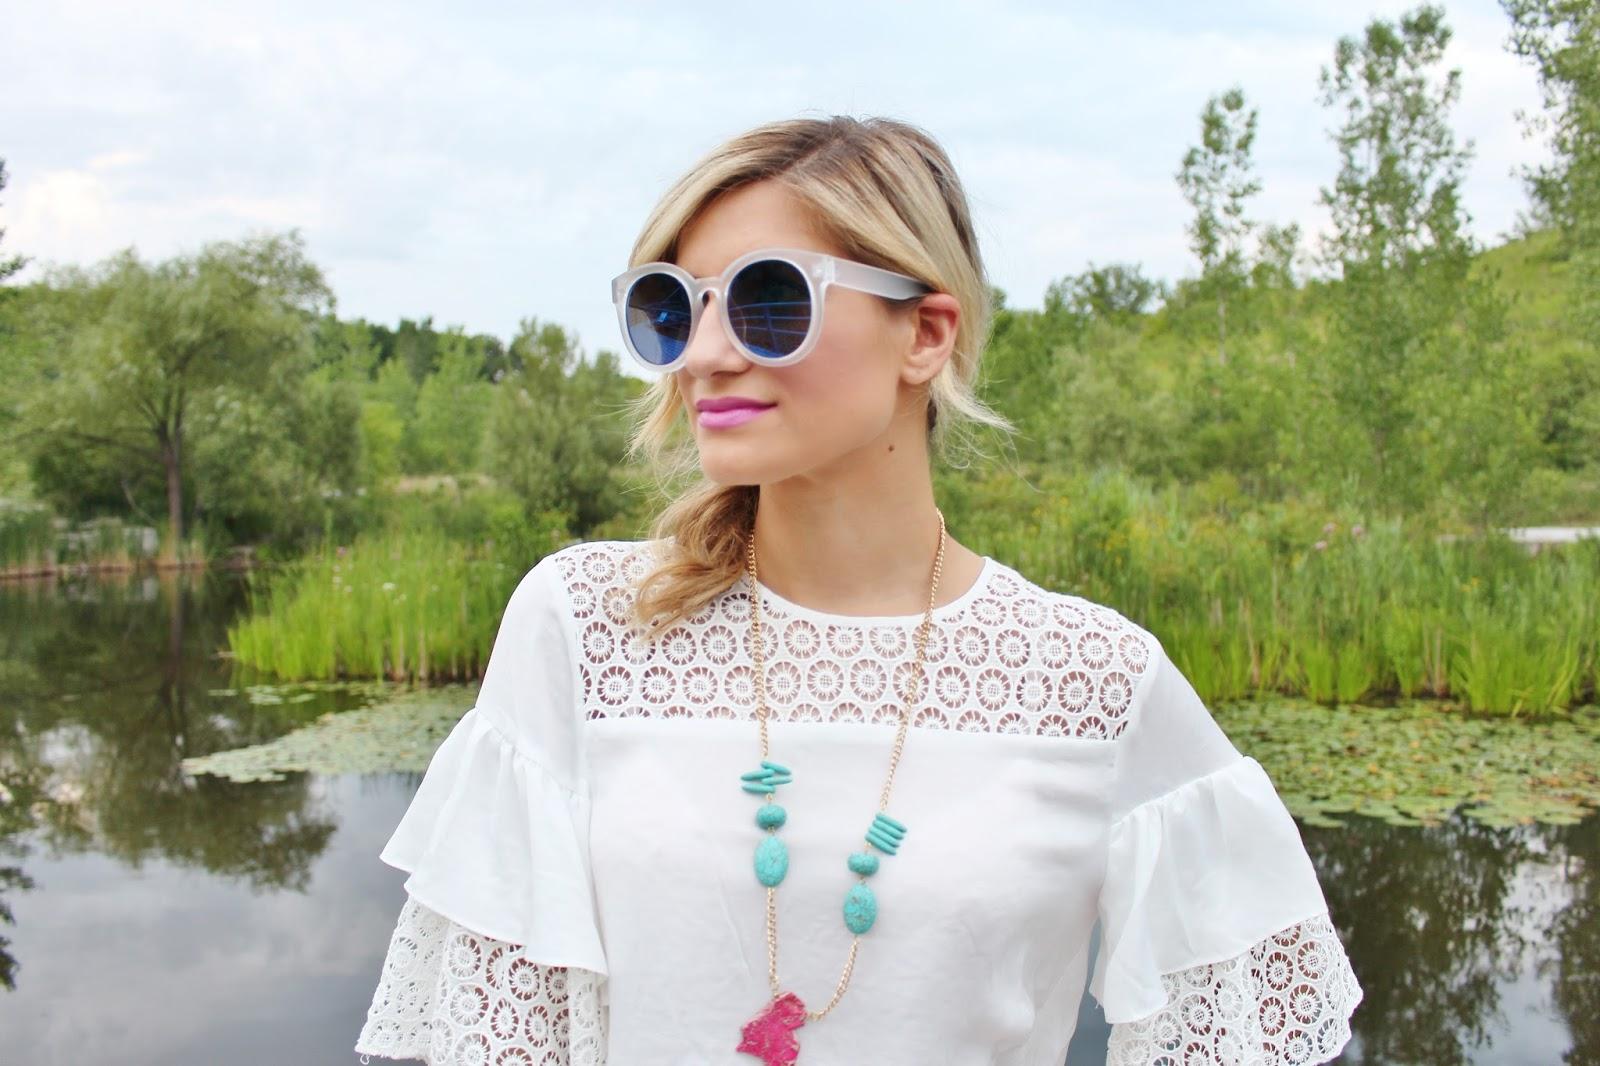 Bijuleni-Shop for Jayu mirrored sunglasses